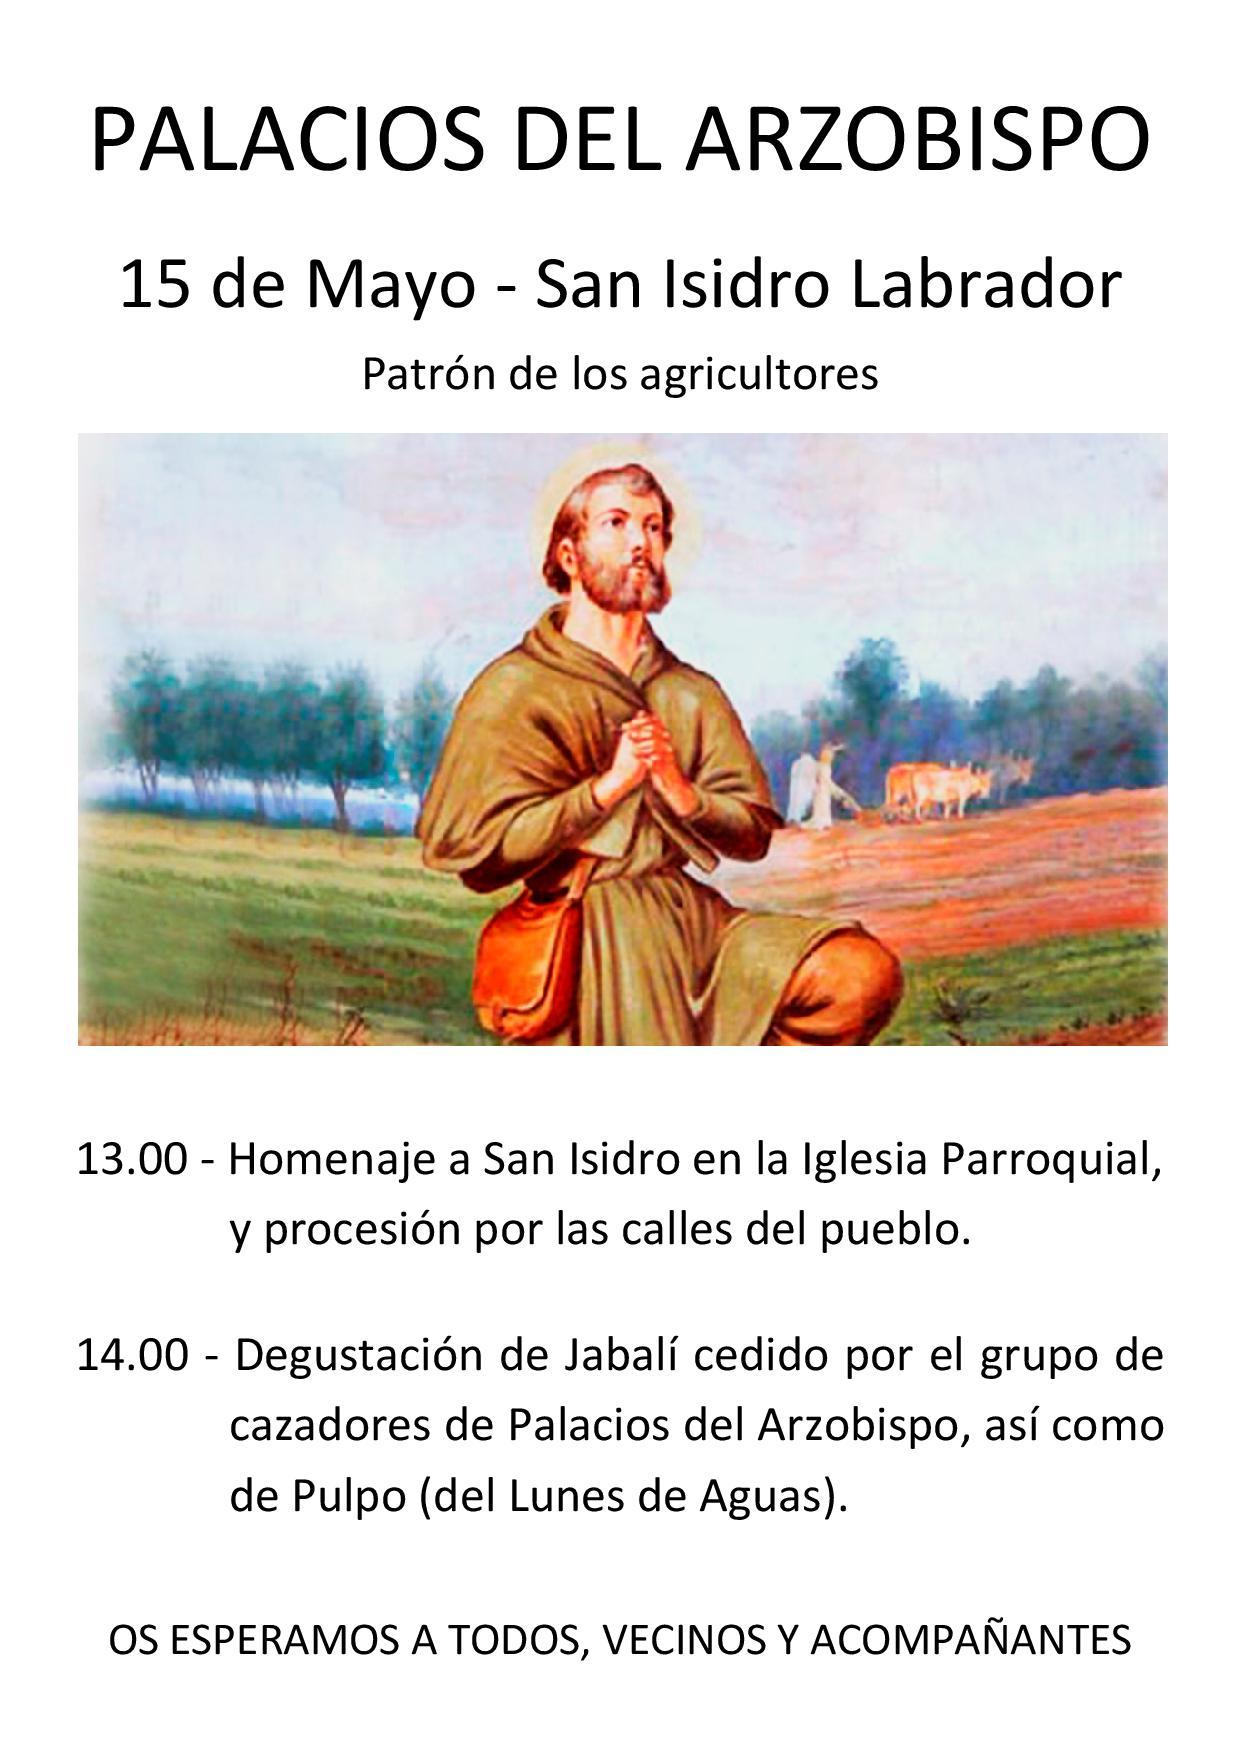 15 de Mayo, San Isidro Labrador.